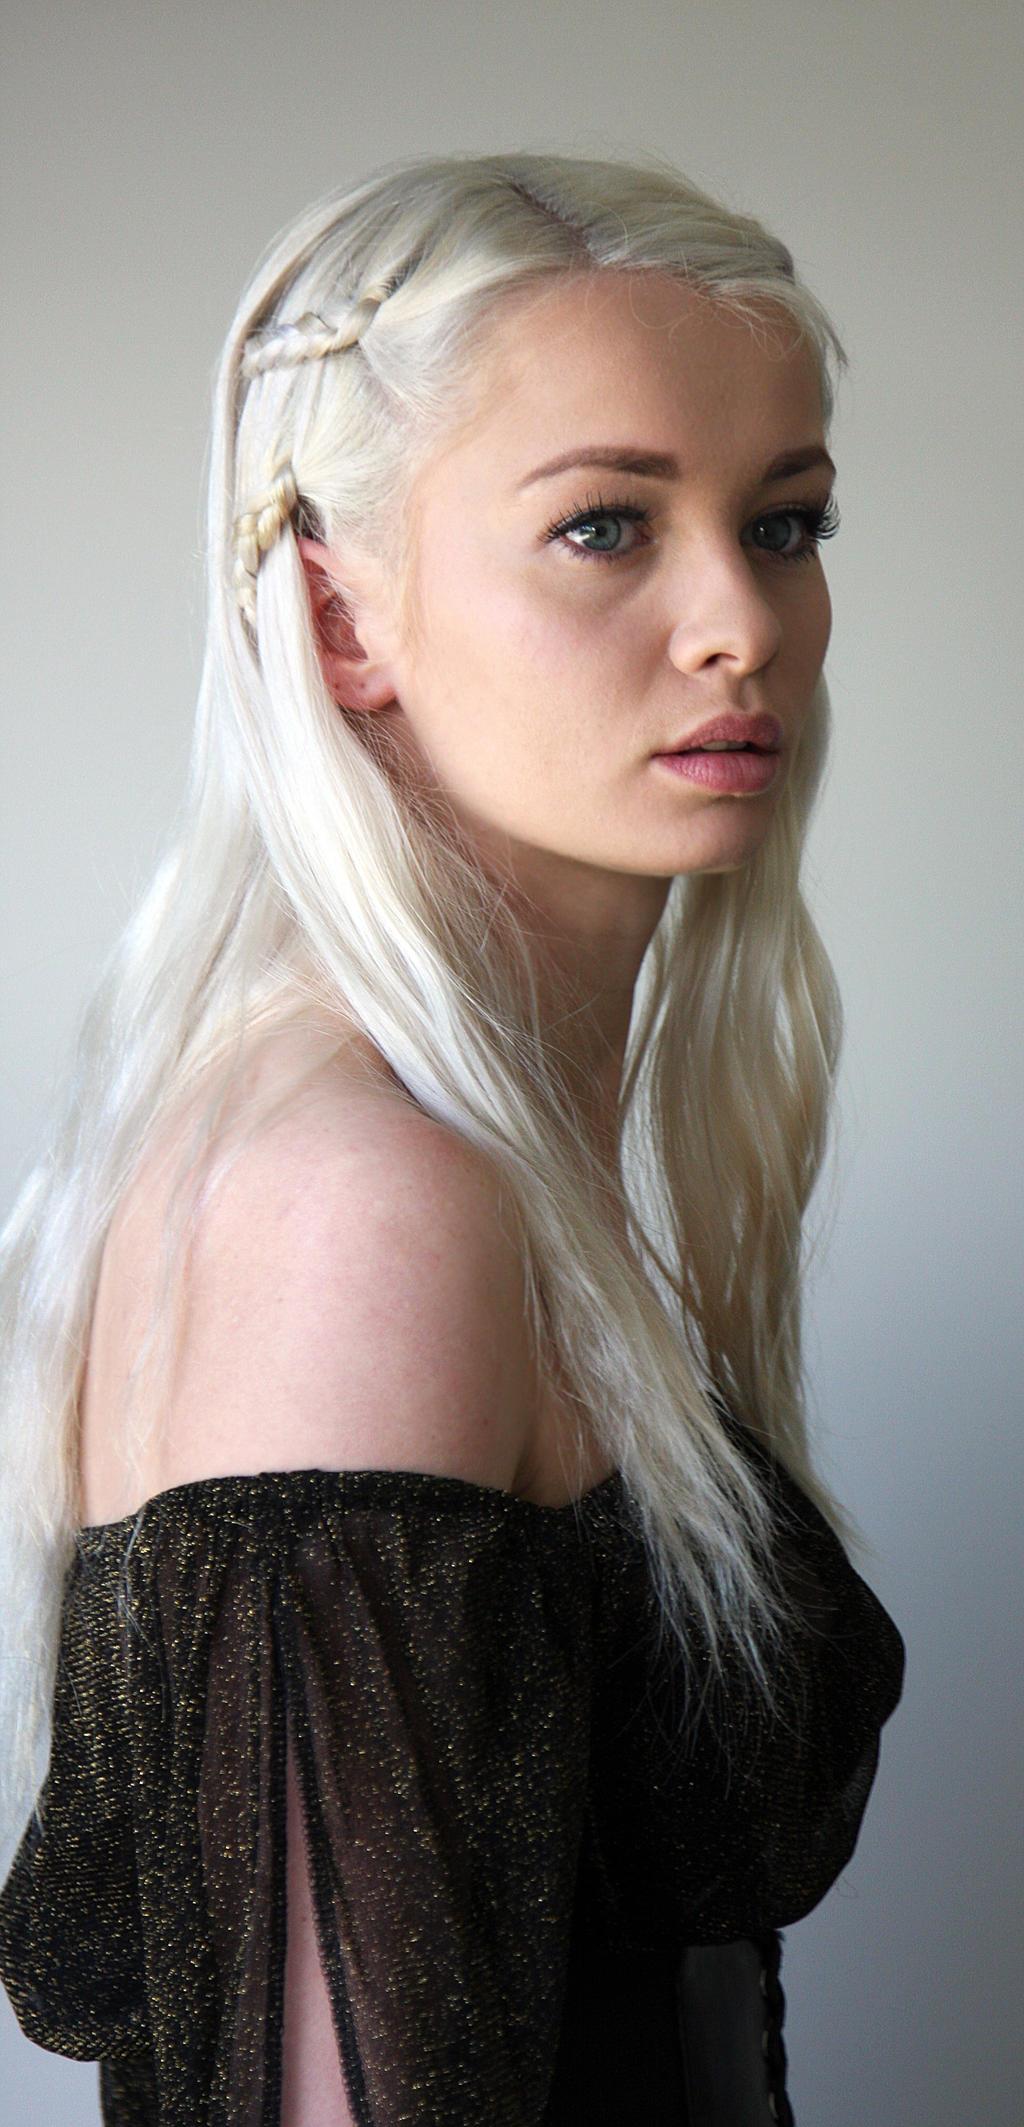 free download female model wallpaper